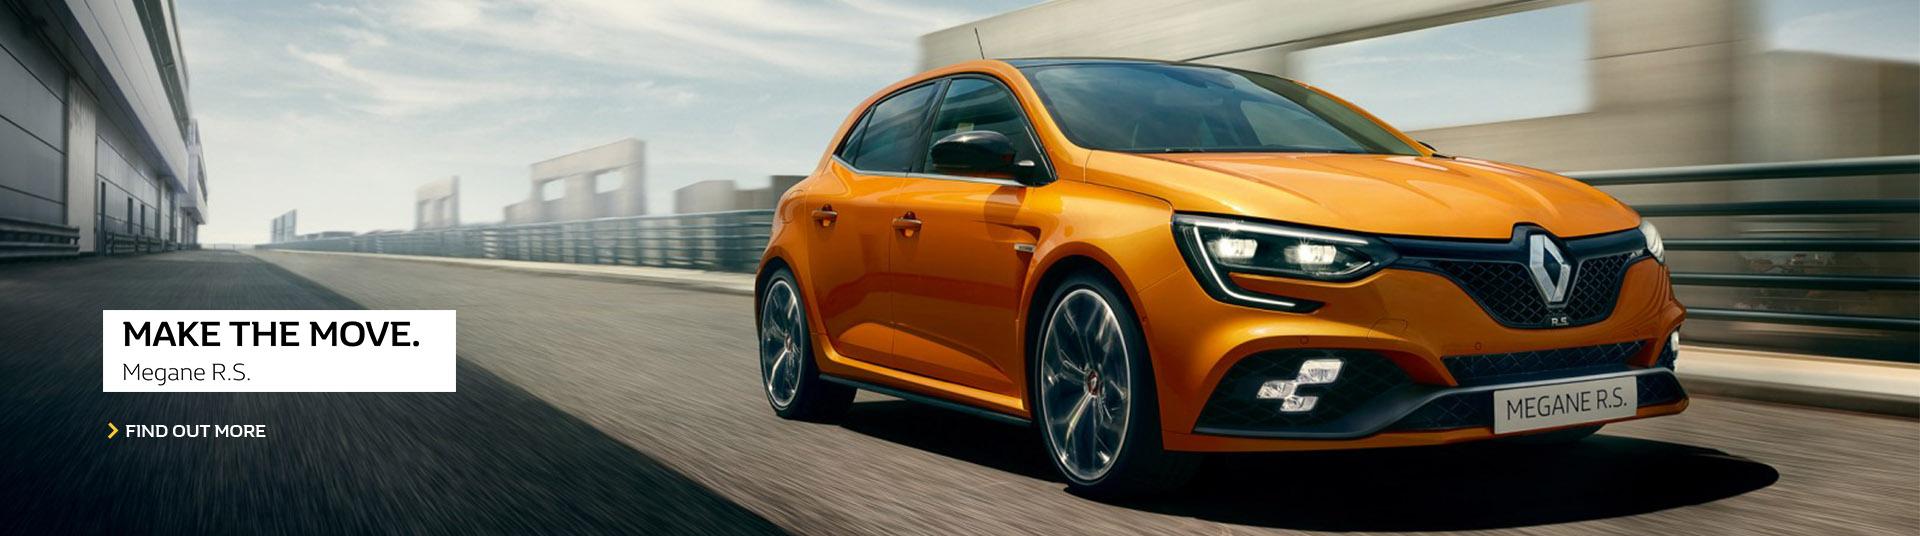 Renault Offers - April 2019